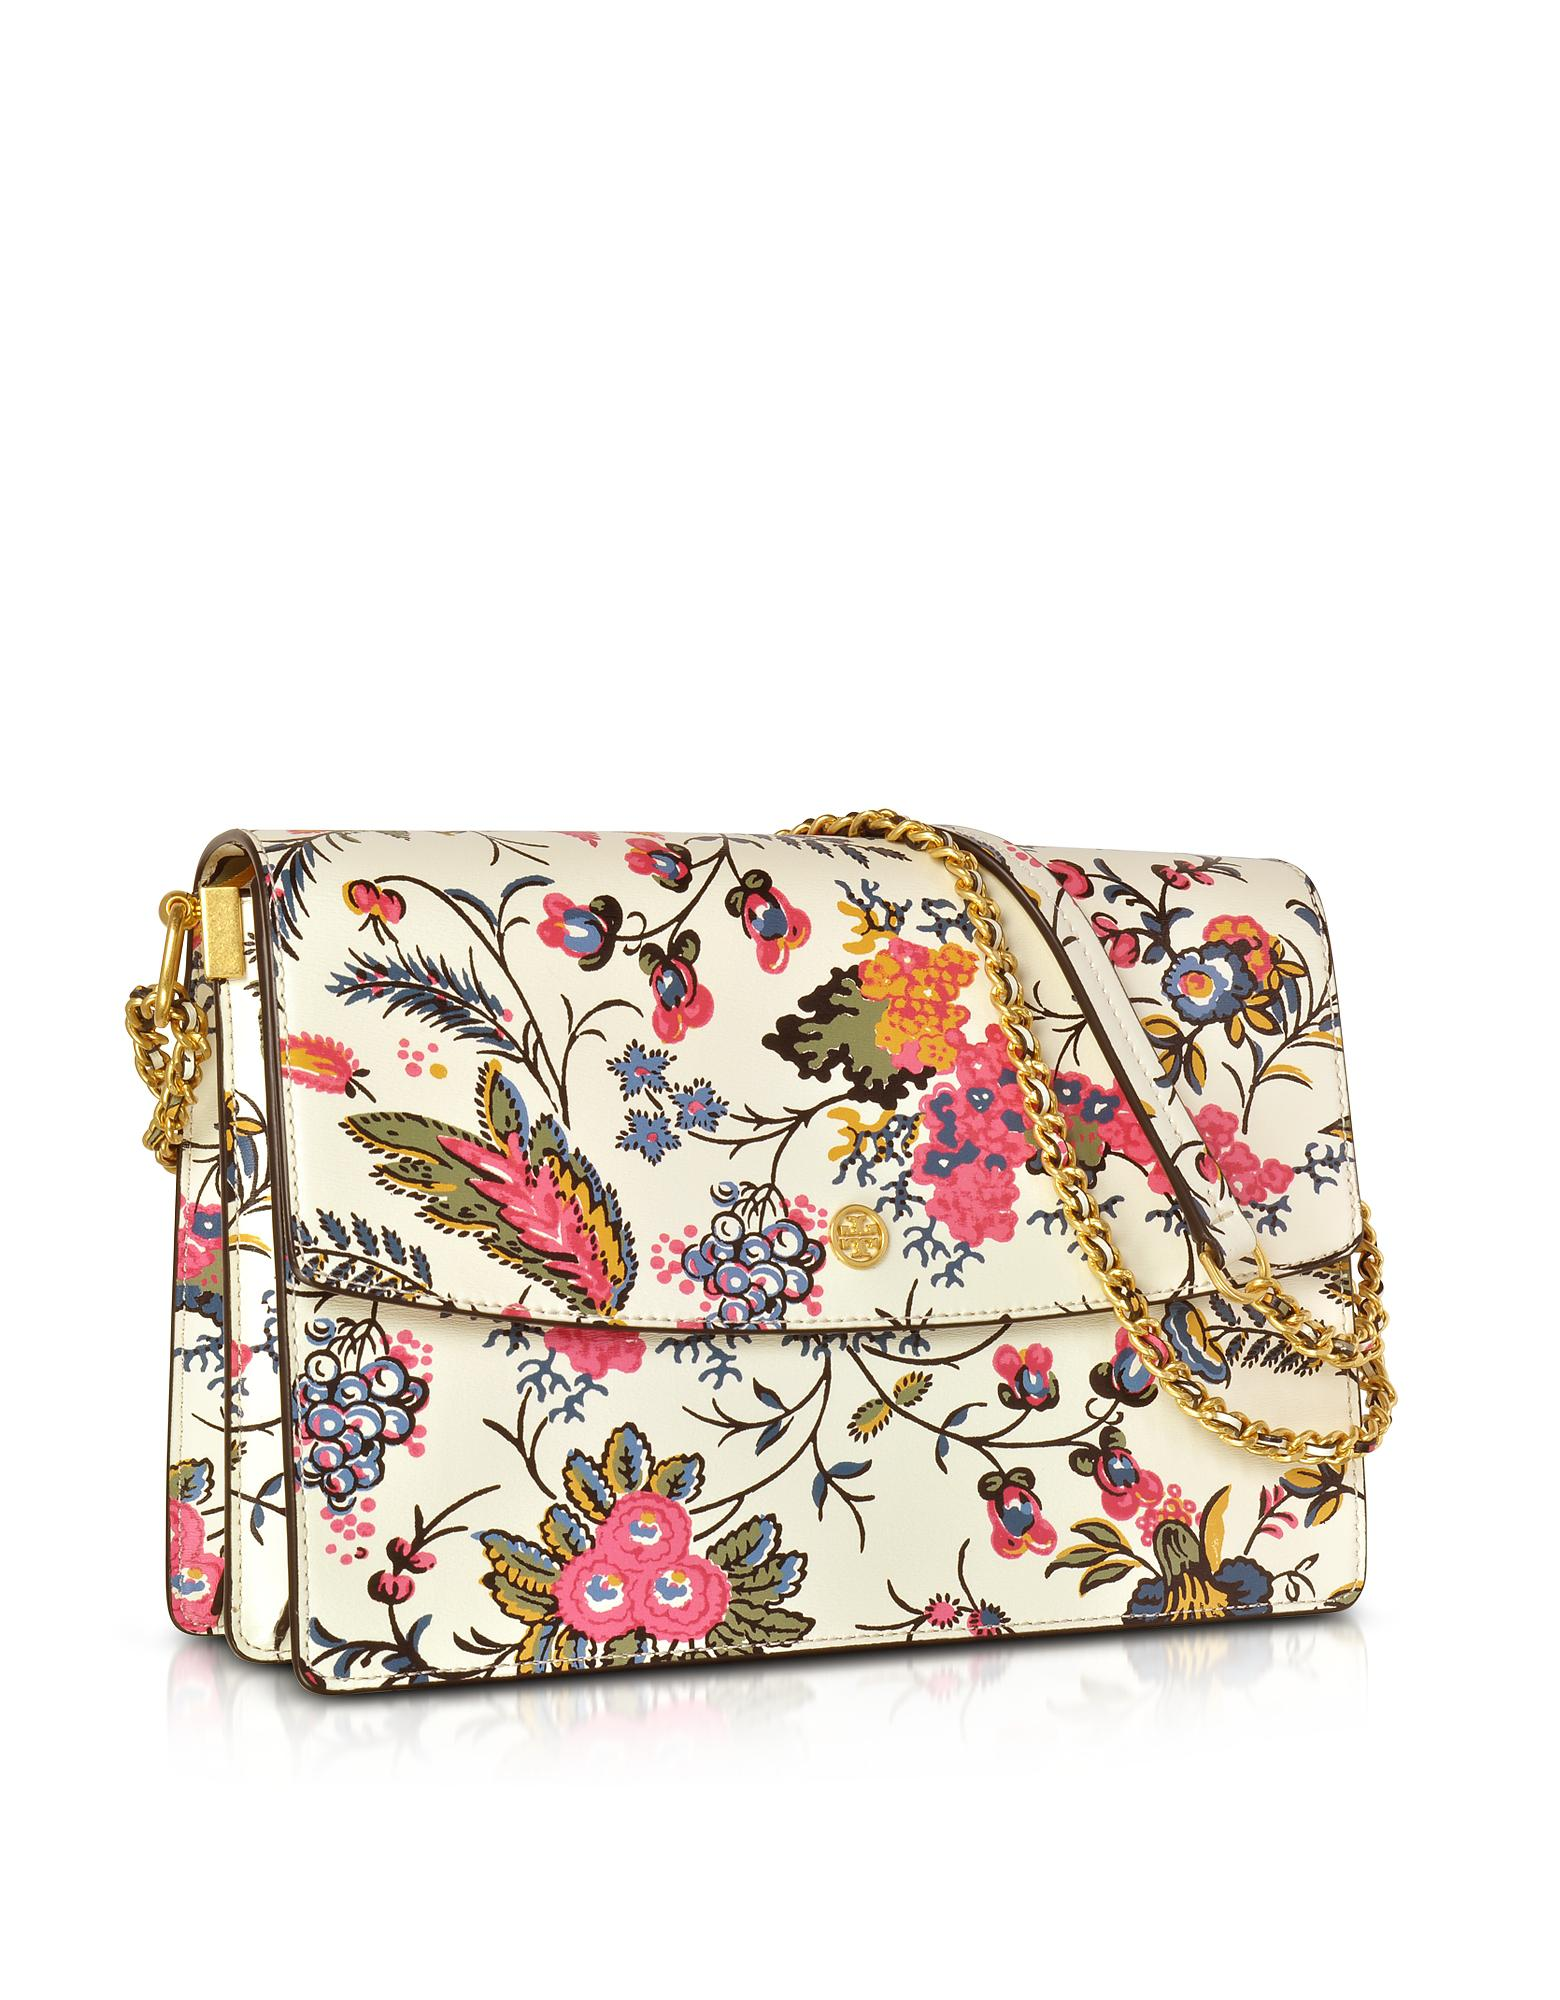 34cb0667 Tory Burch White Parker Gabriella Floral Print Leather Large Soulder Bag